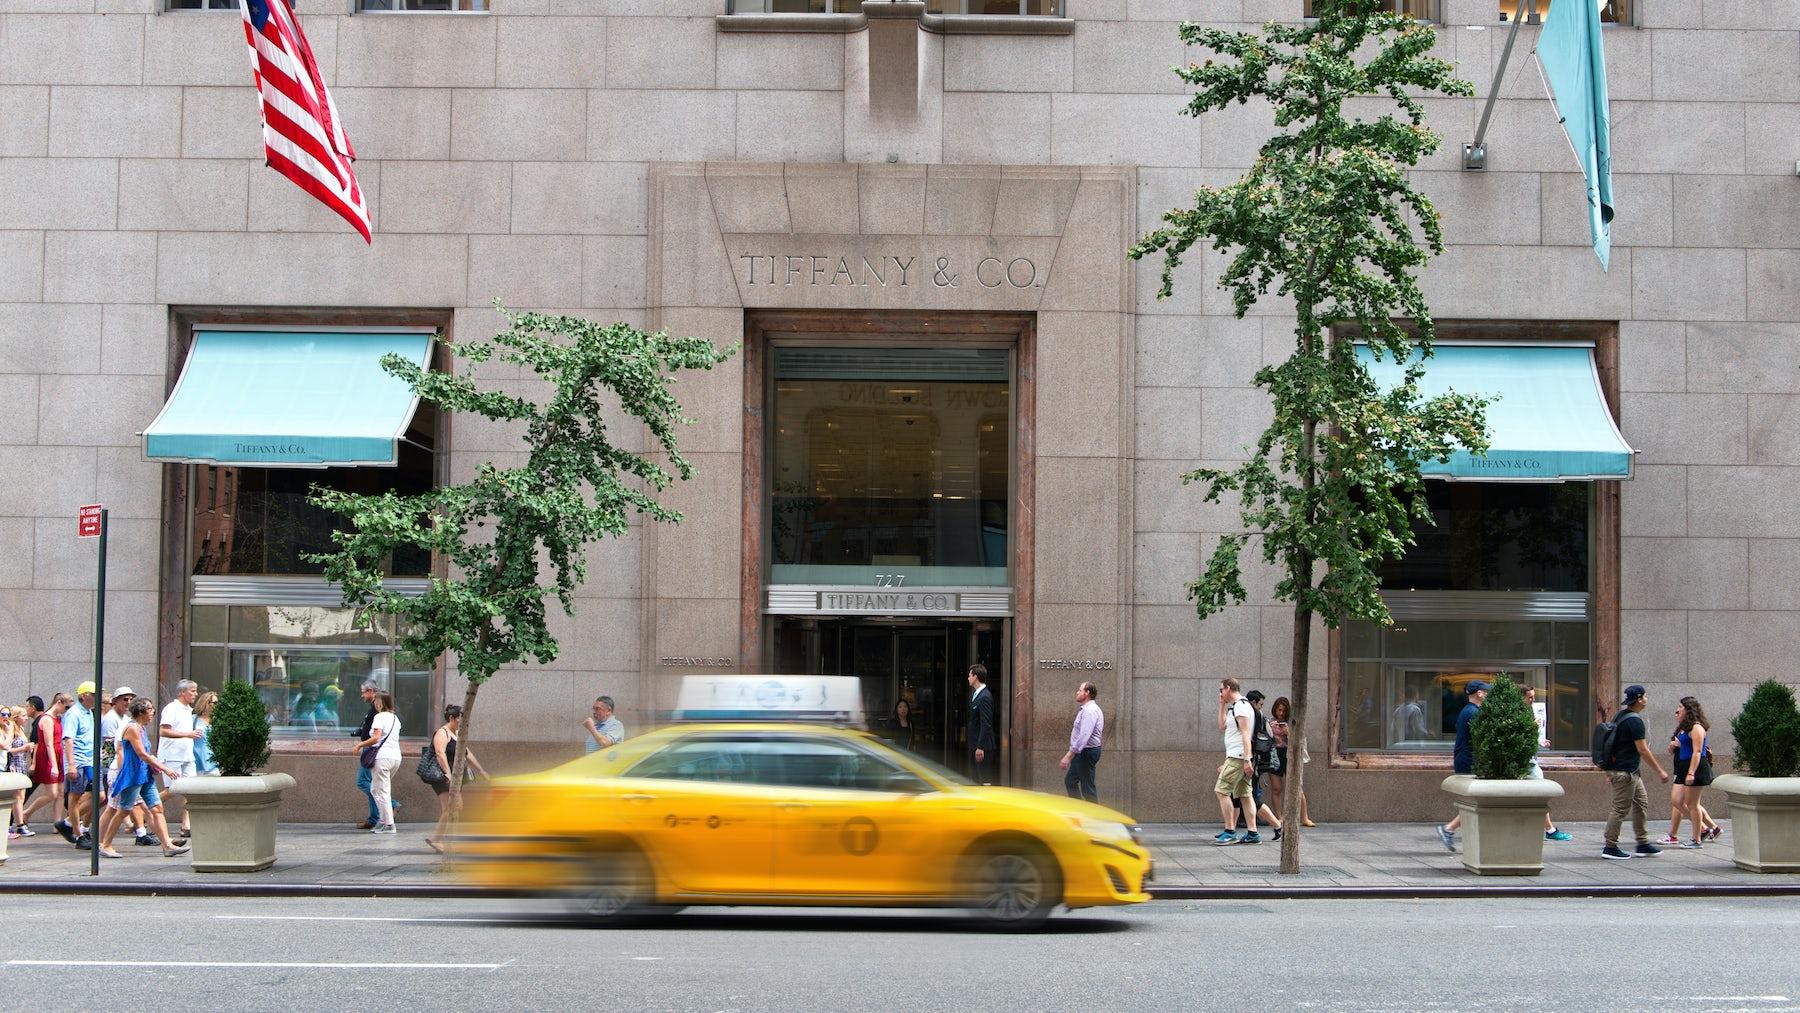 Tiffany & Co. Fifth Avenue Store | Source: Shutterstock